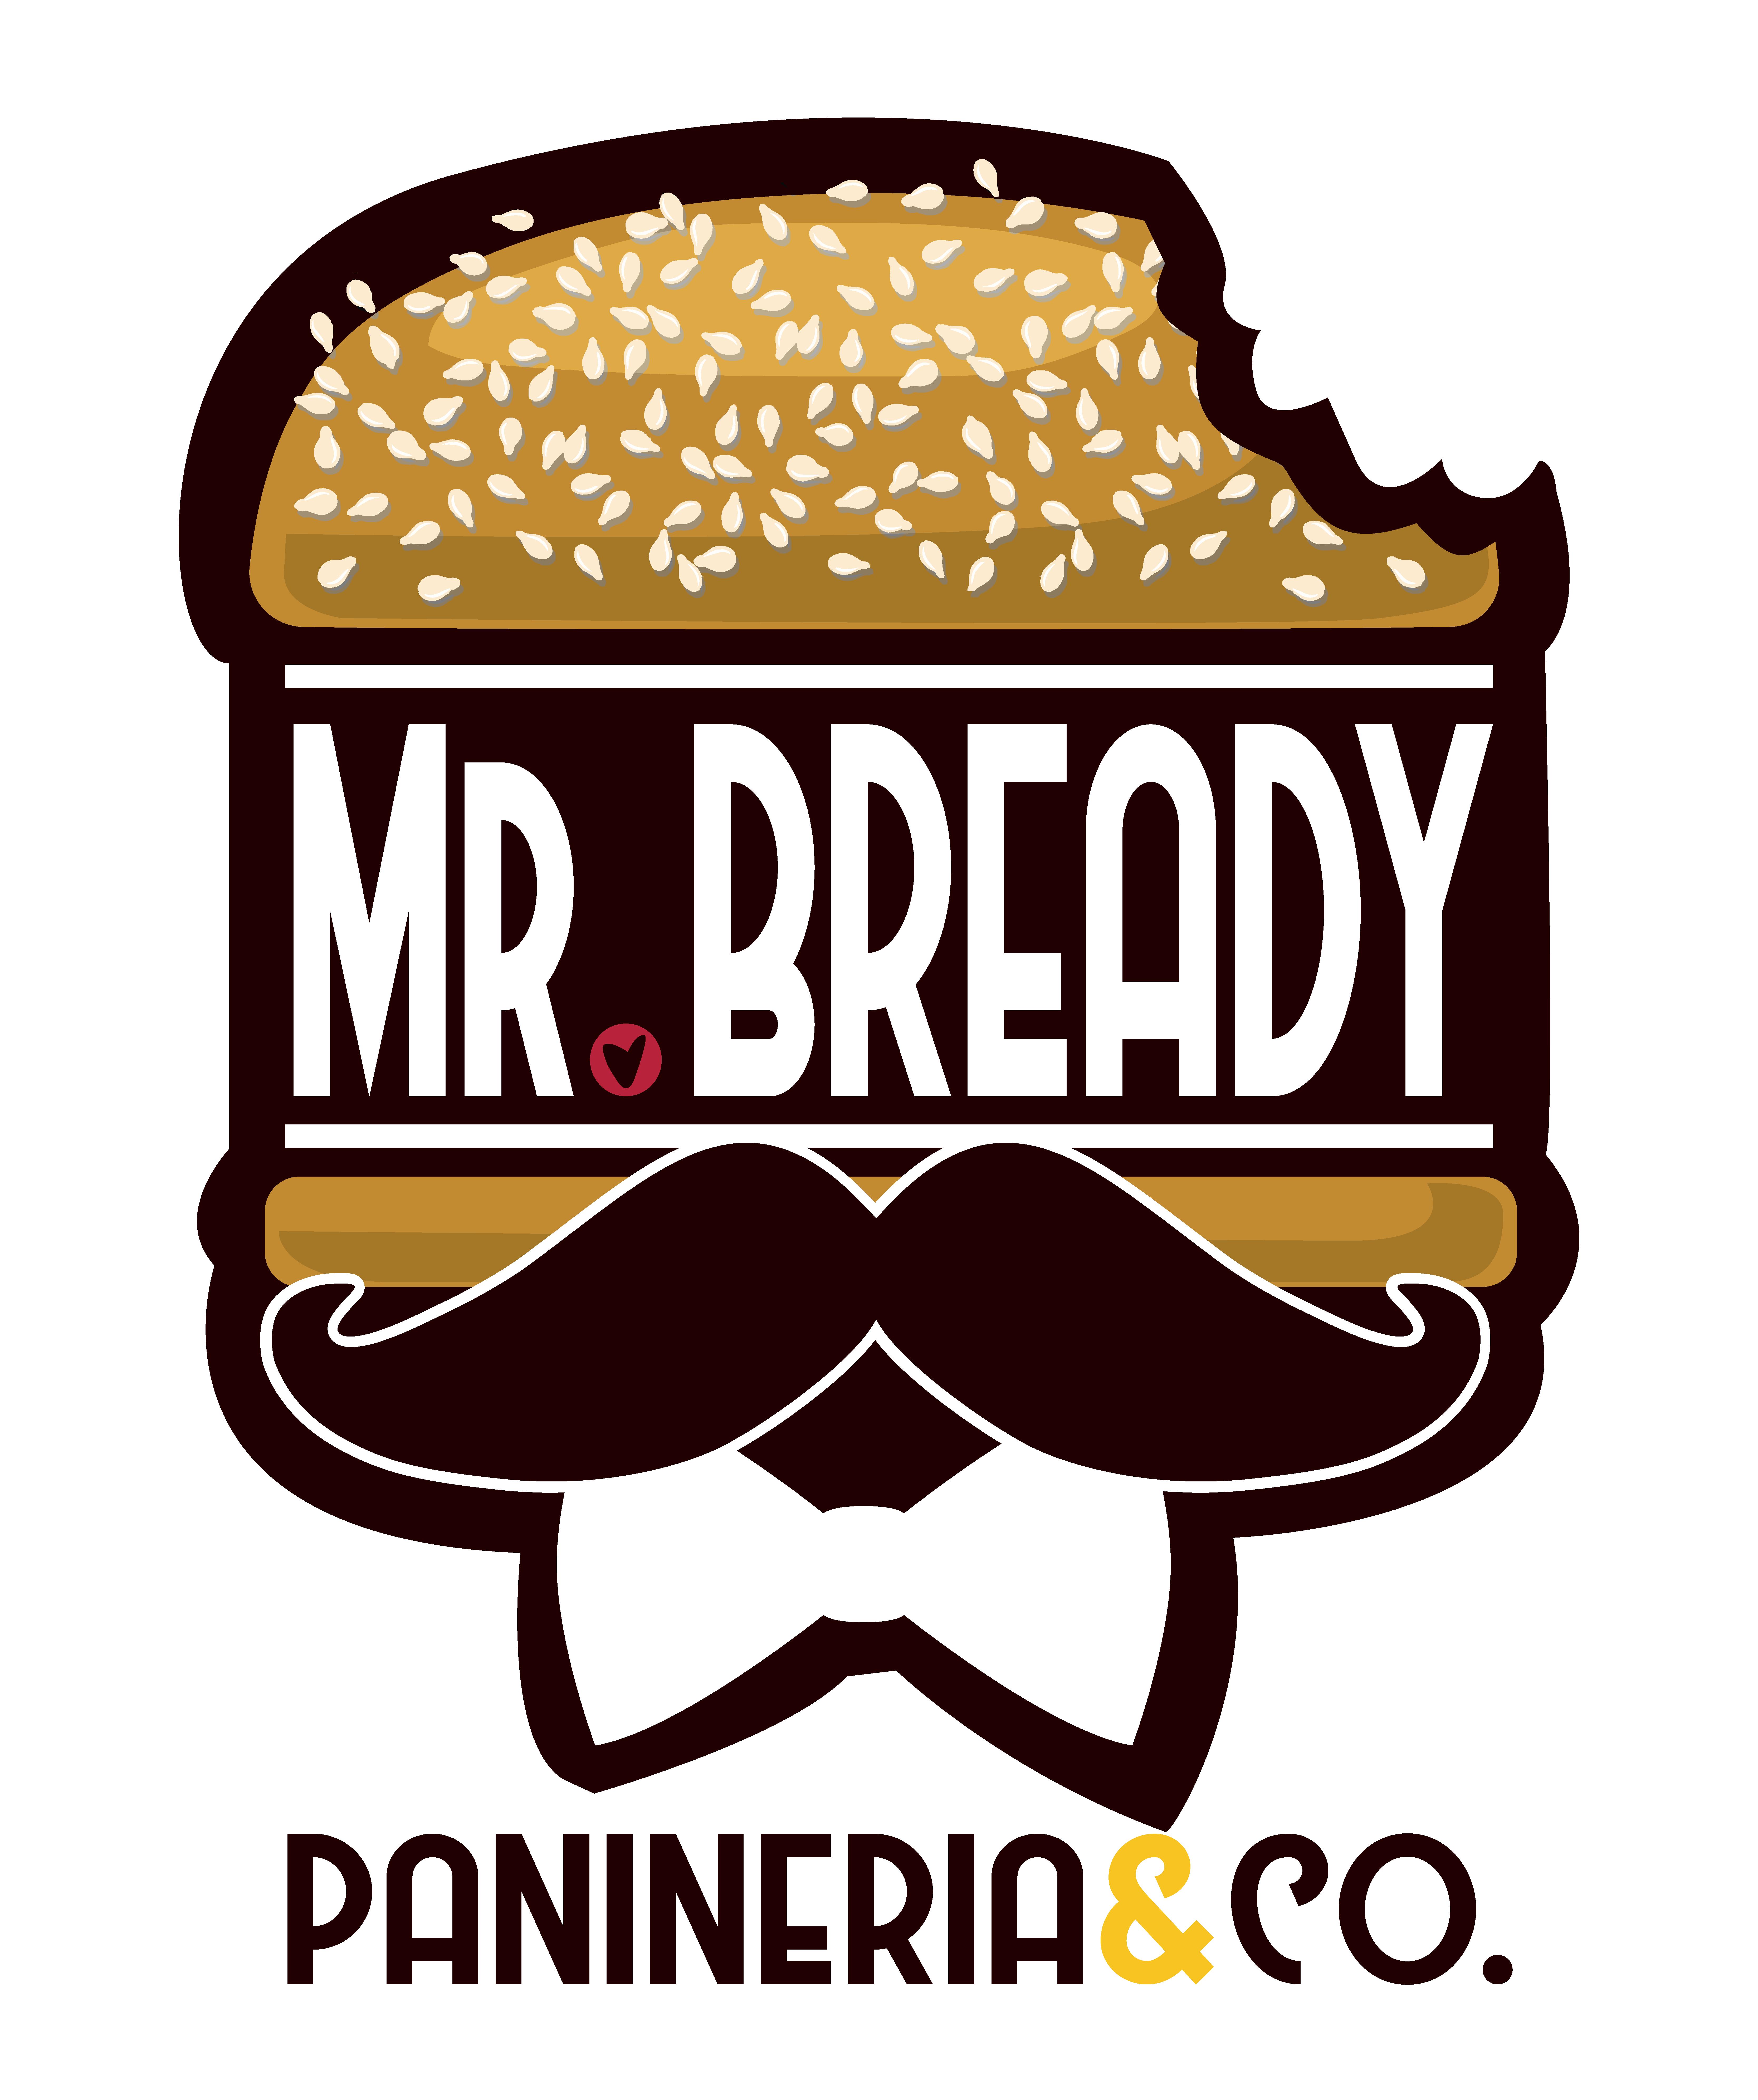 Mr Bready